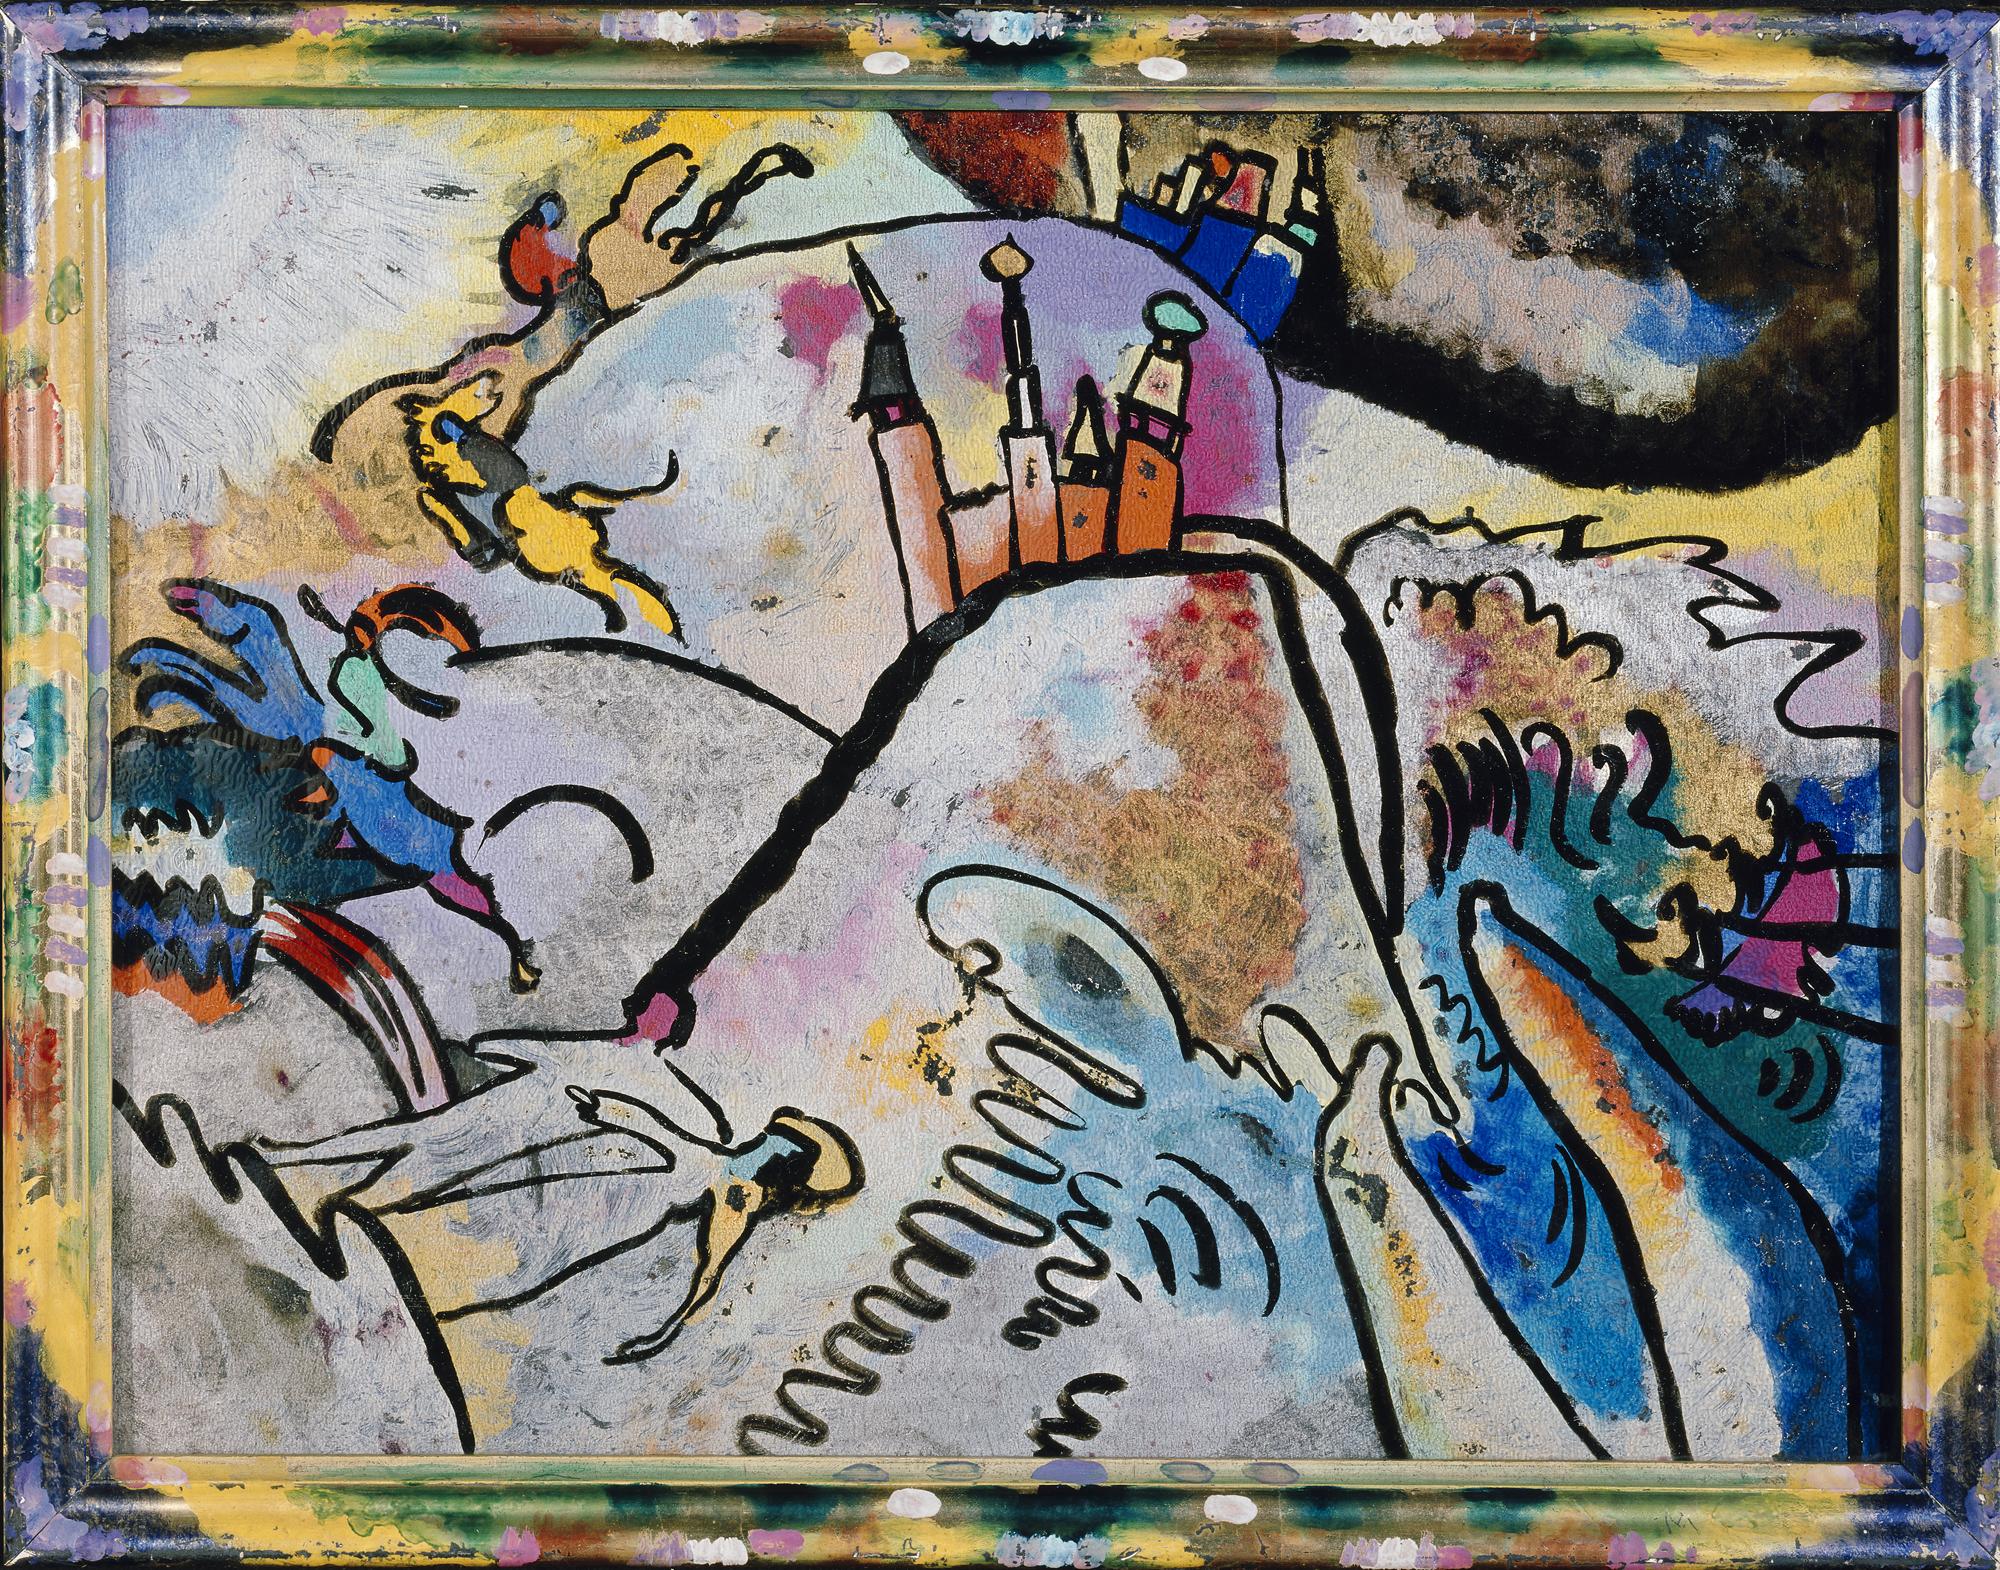 Vasily Kandinsky, With Sun, 1910, glass painting, 30.6 x 40.3 cm (Städtische Galerie im Lenbachhaus)